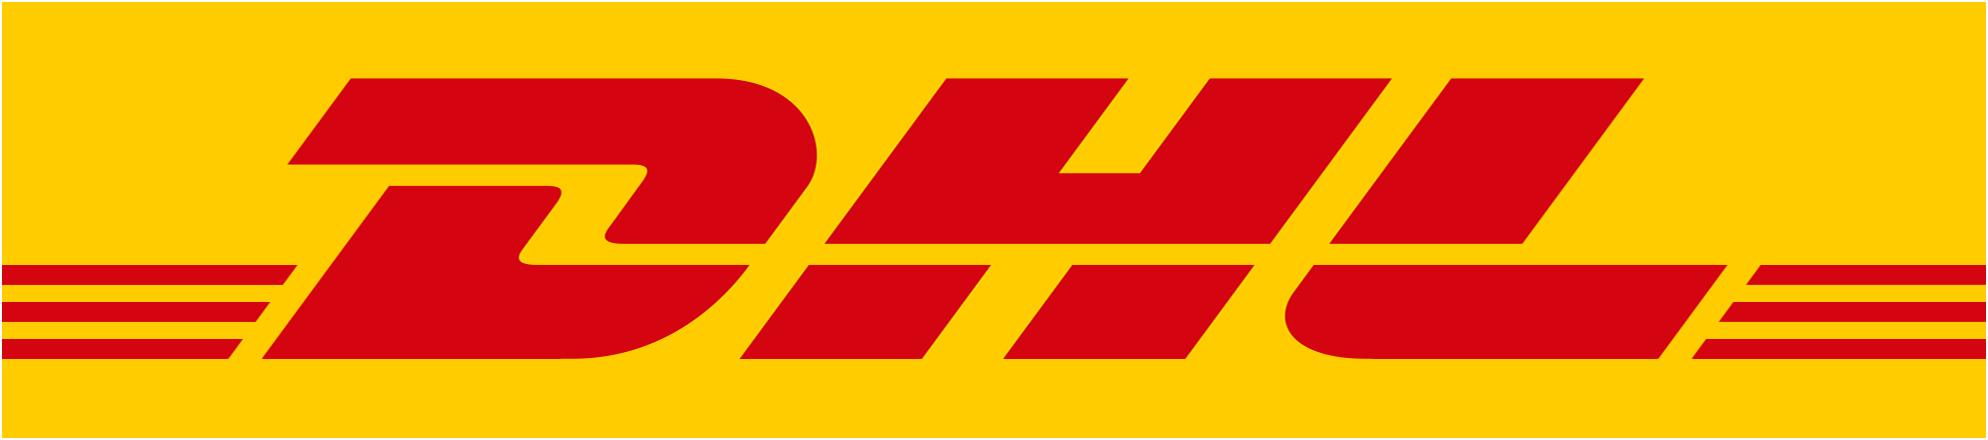 DHL Express (Austria) GmbH